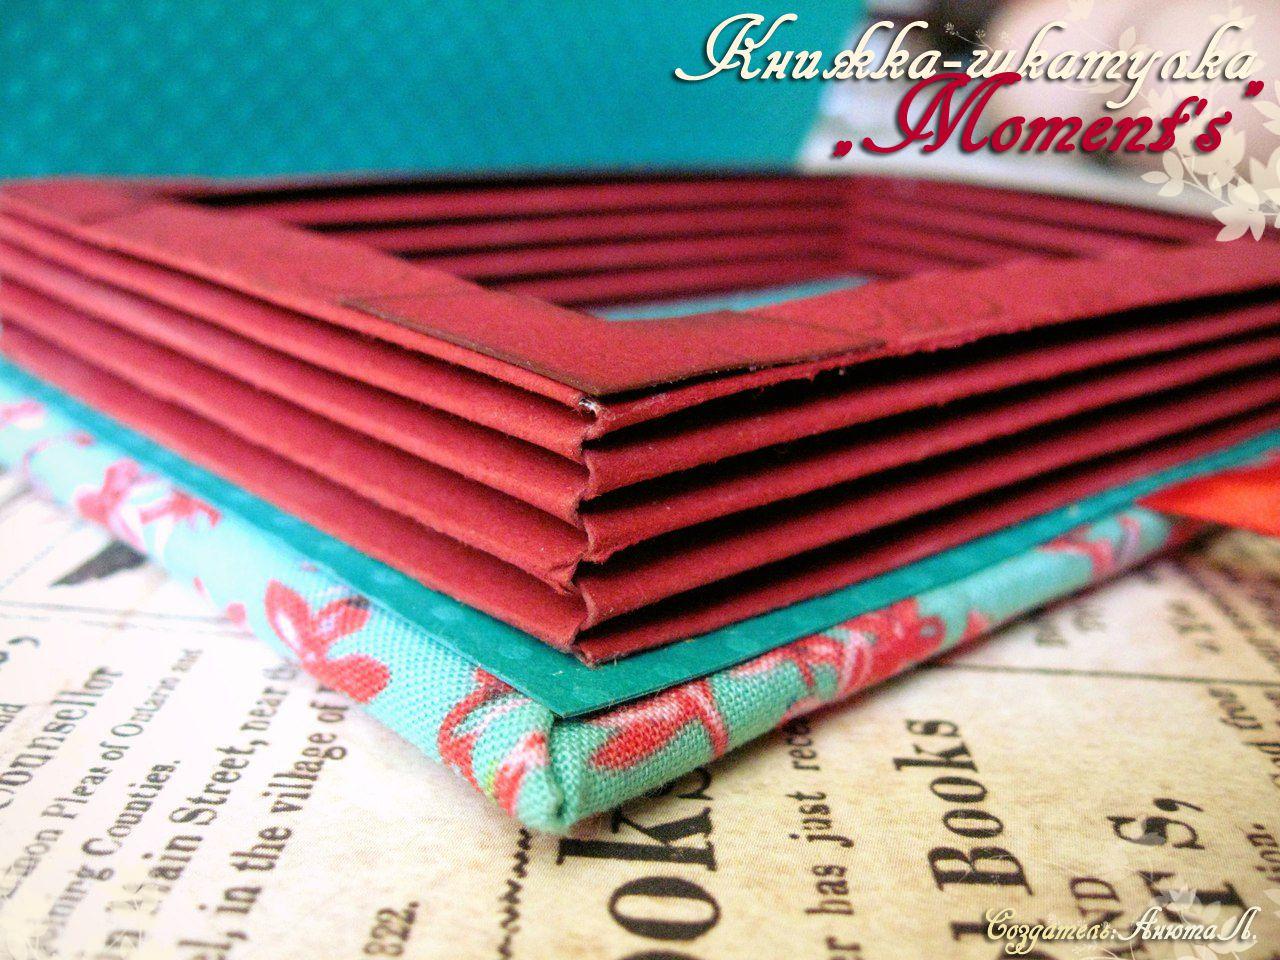 box pink jewelry book paper